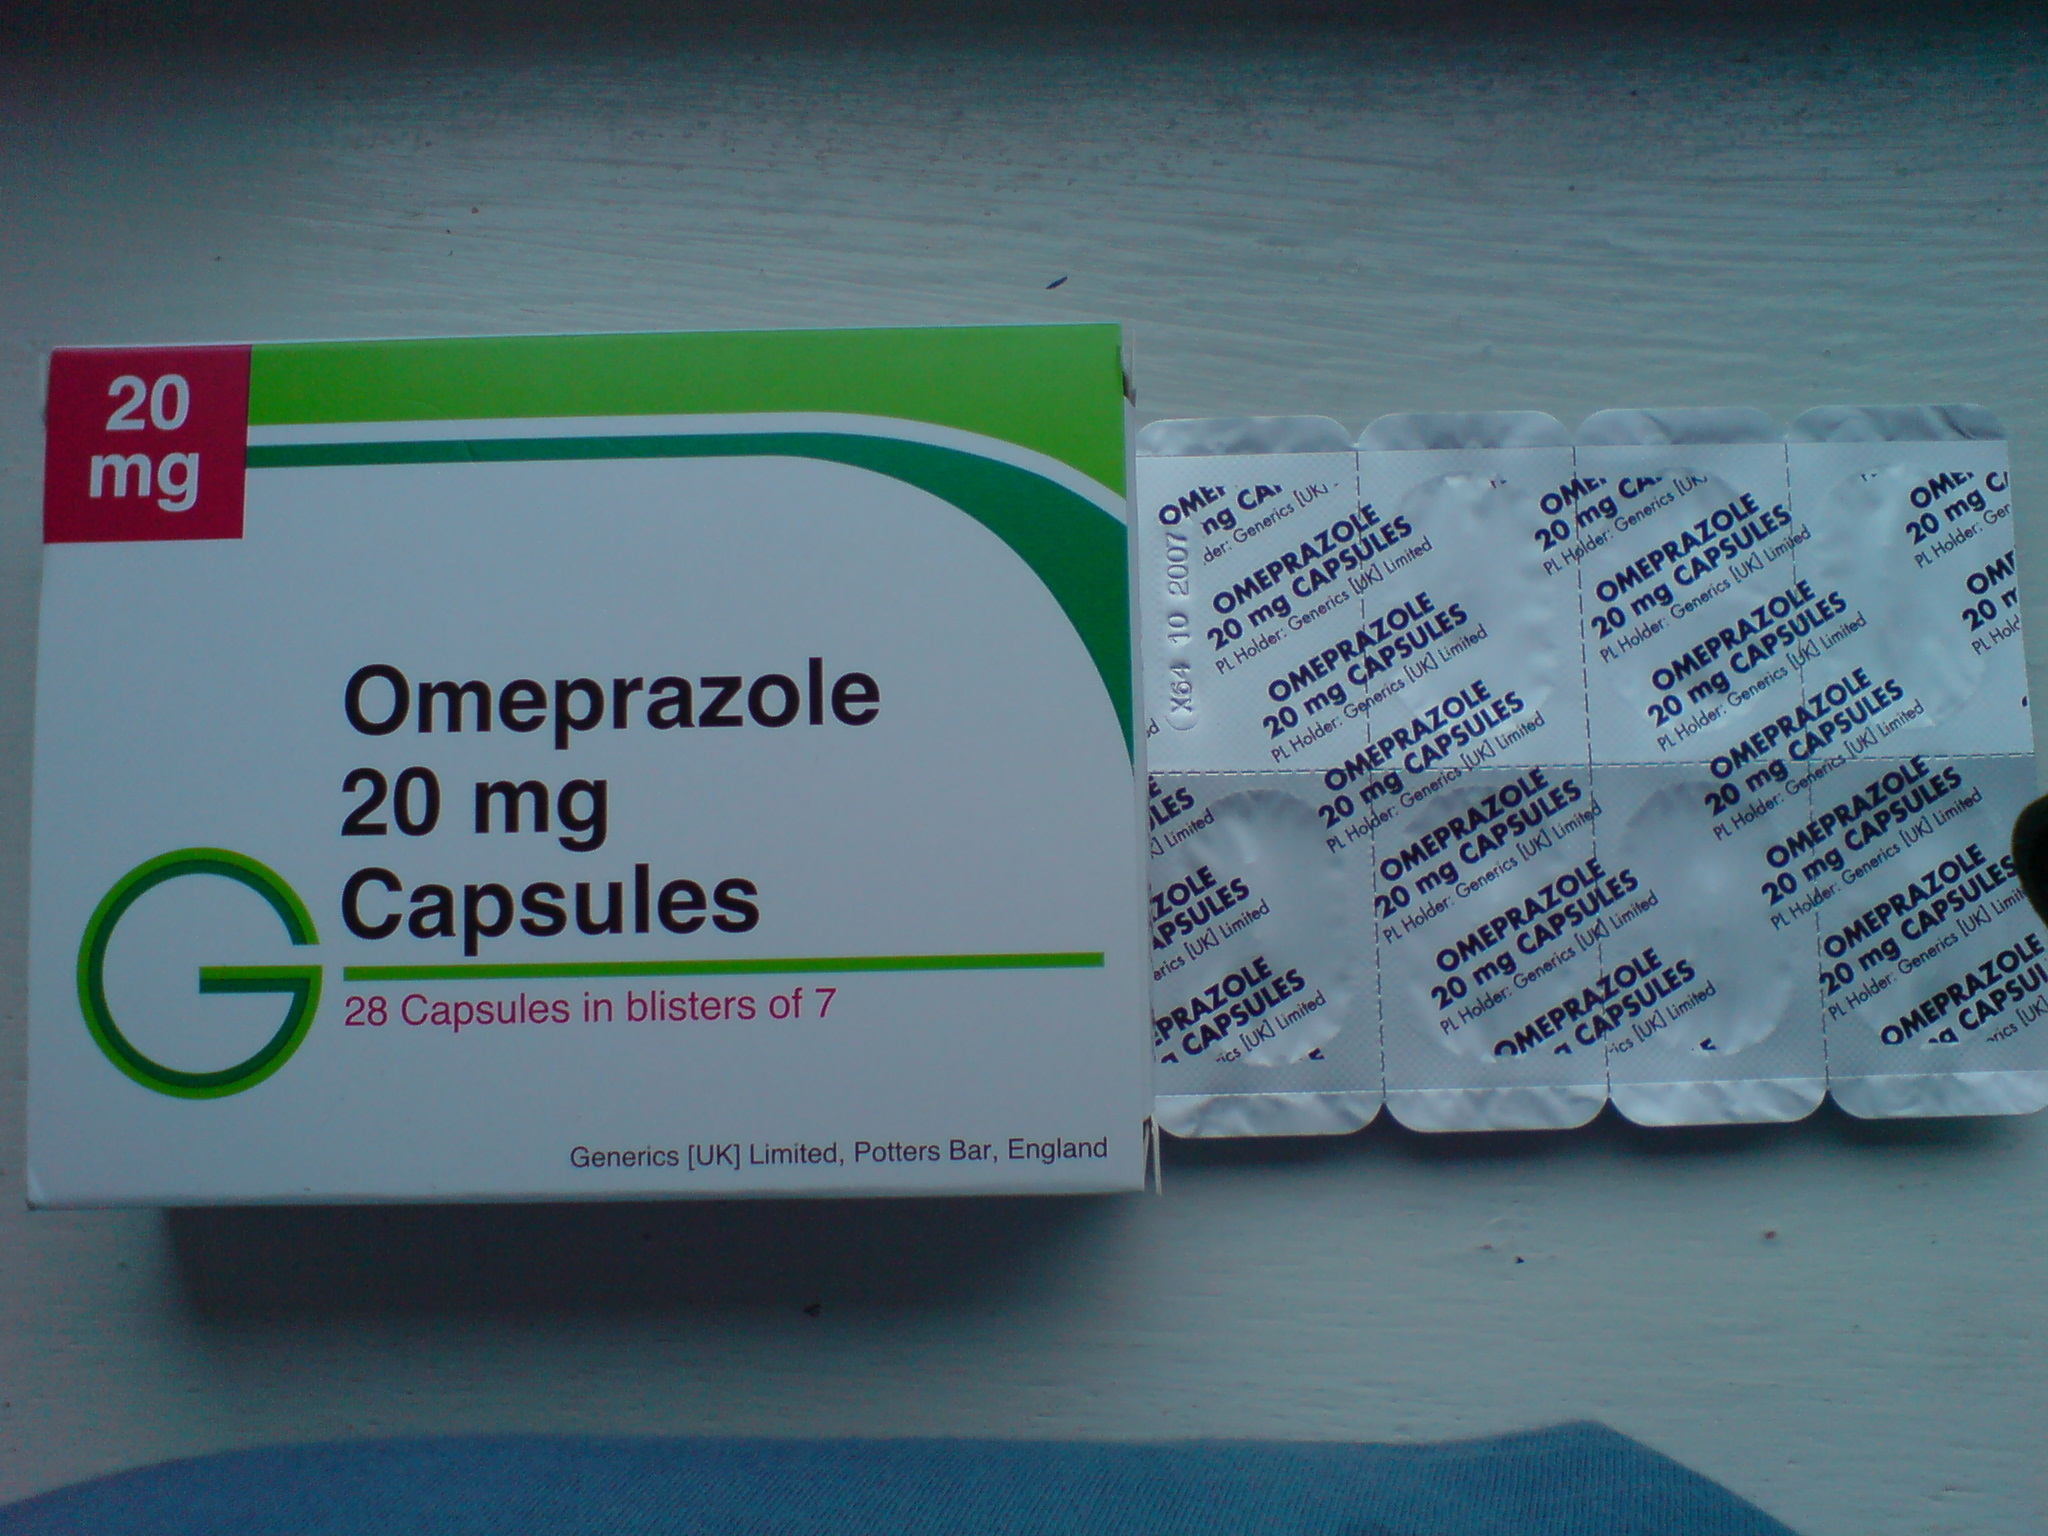 اومبيرازول Omeprazole 20mg